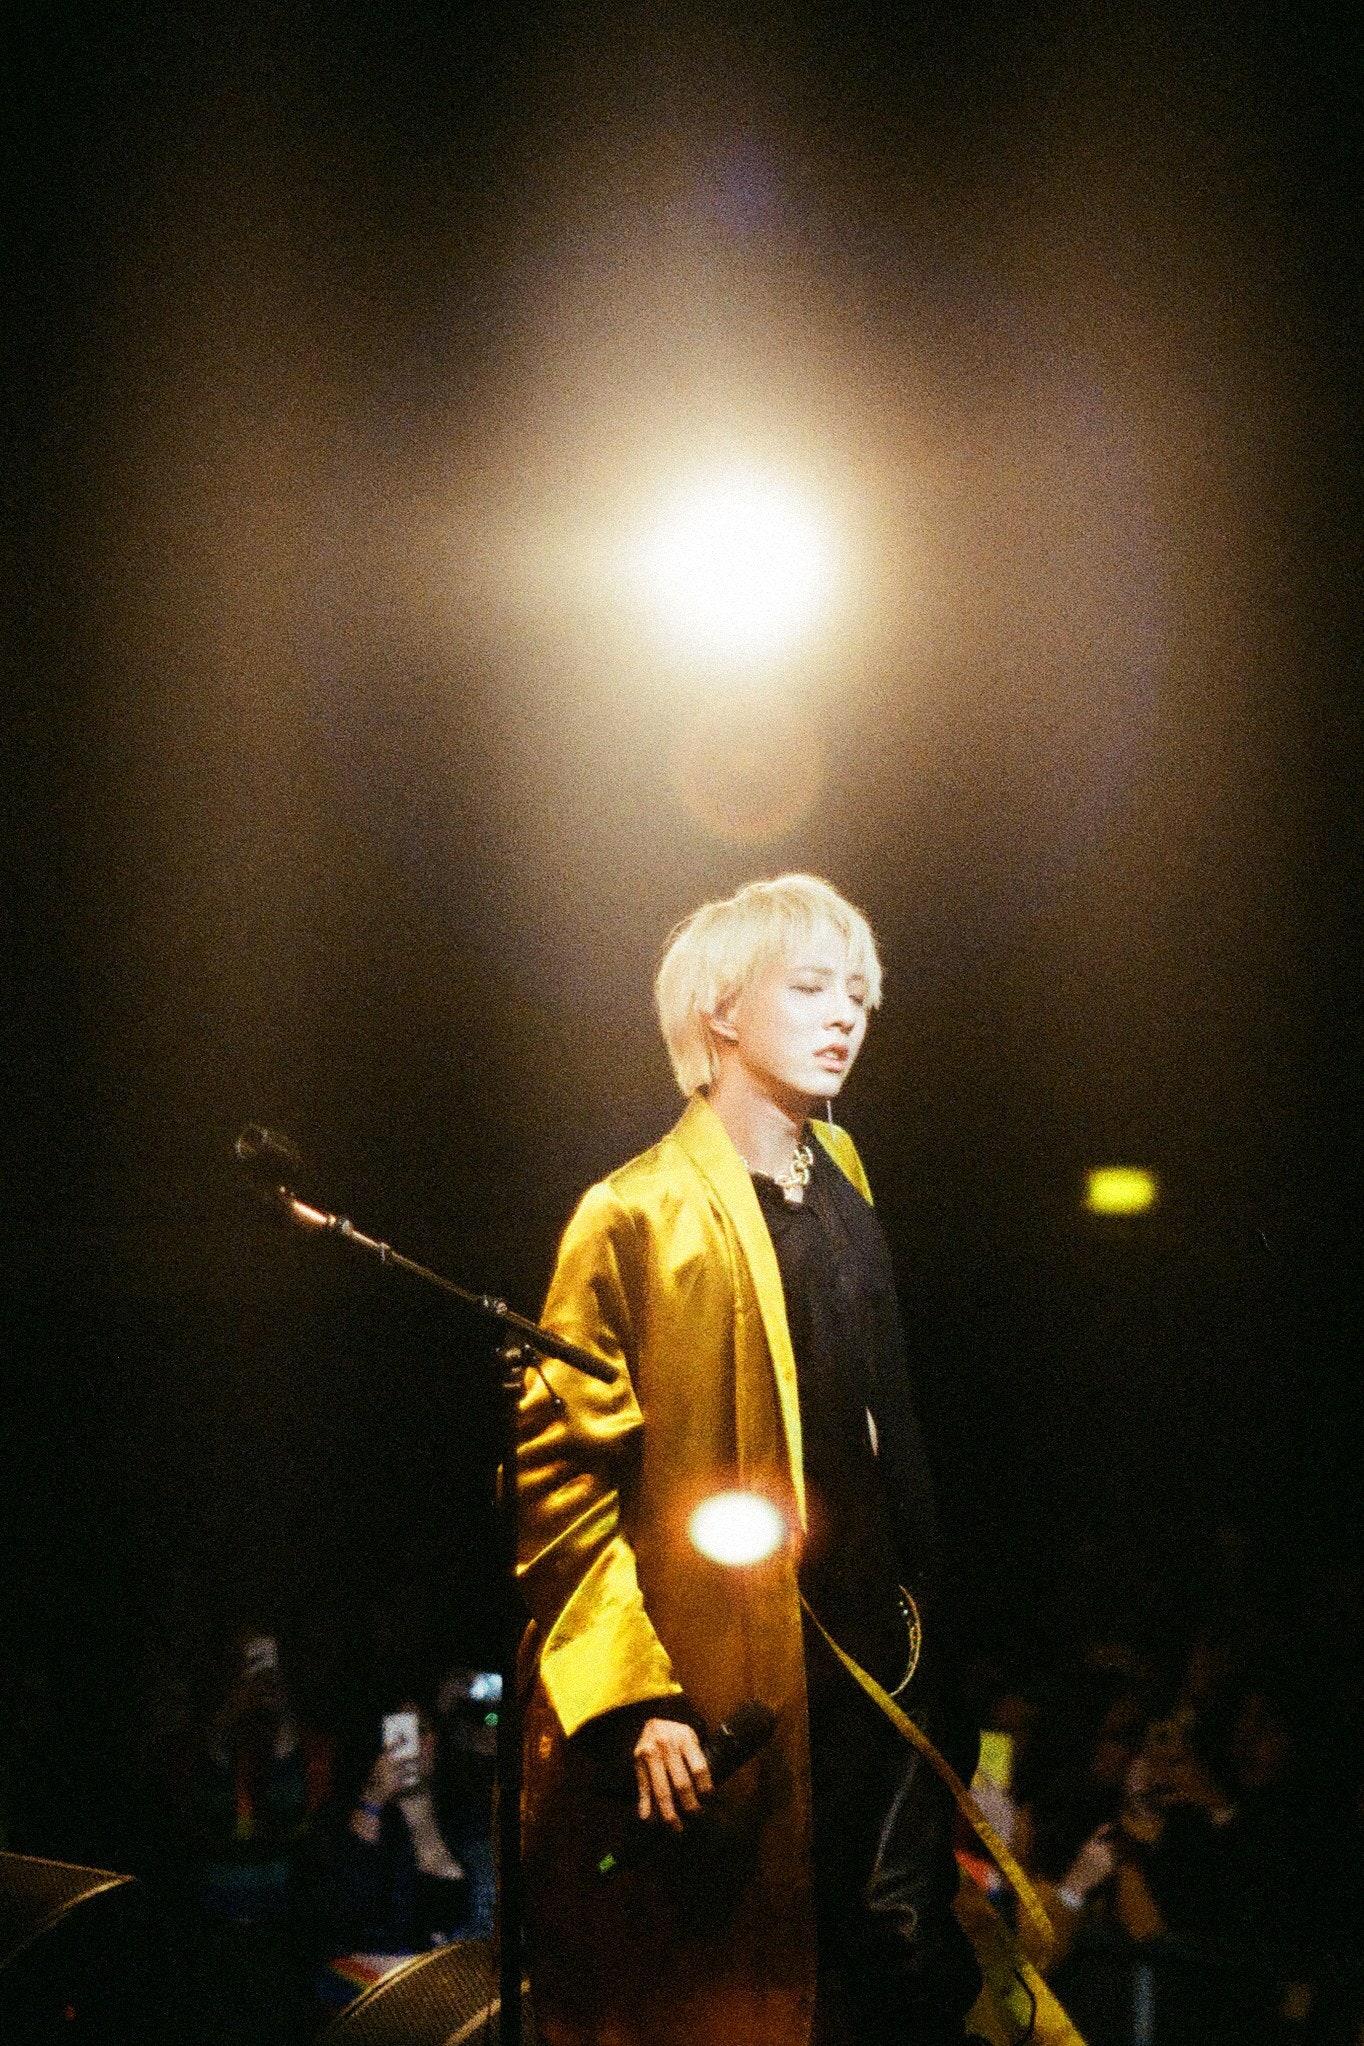 Holland:「你值得被愛,你最必須愛的人是你自己,而不是別人。」韓國樂壇首位出櫃的偶像解釋,為何「出櫃」這件事這麼重要